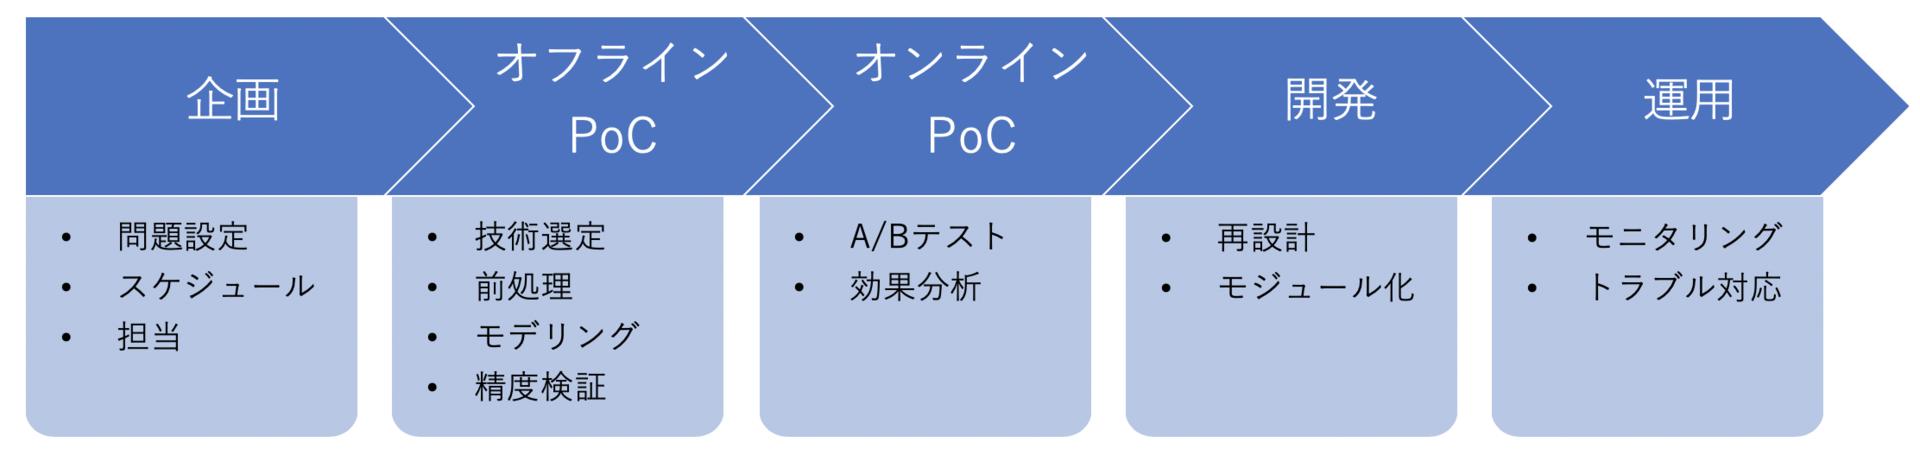 f:id:livesense-analytics:20200109150829p:plain